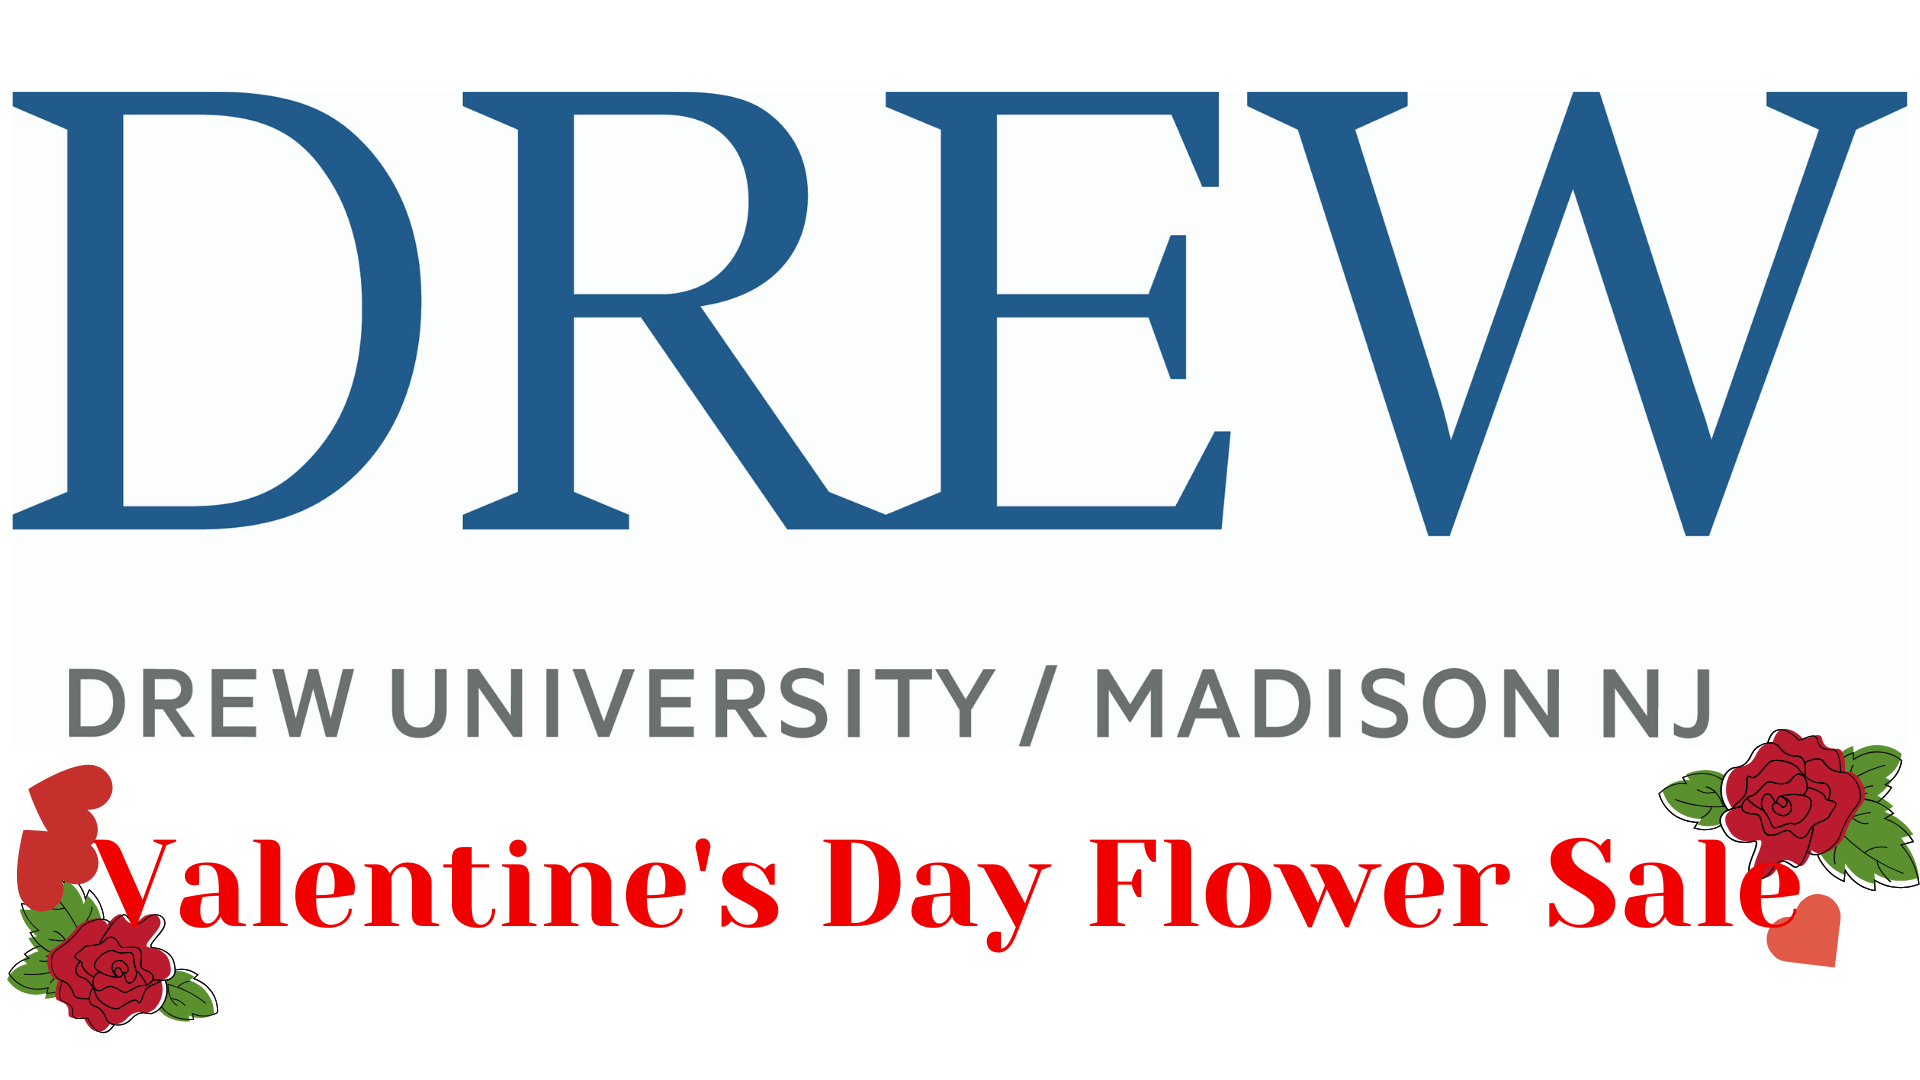 Drew University Valentine's Day